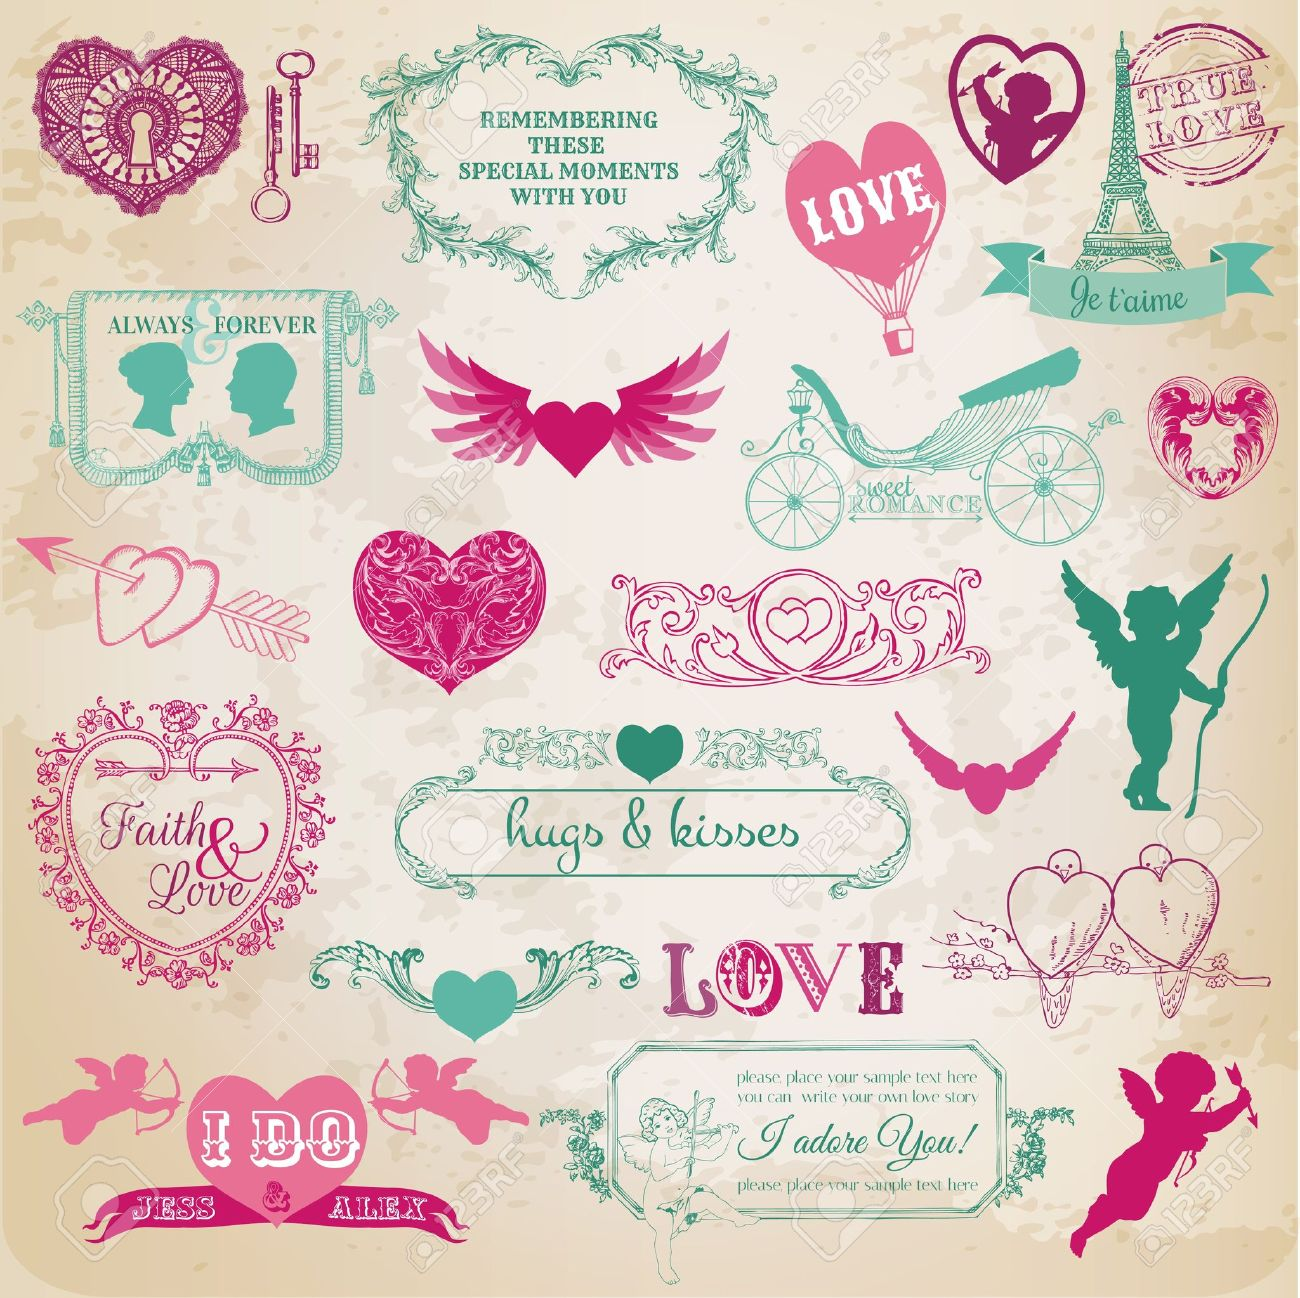 scrapbook, love, valentine, wedding, vintage, scrap, scrapbooking, invitation, calligraphy, heart, cupid, angel, frame, bird, design, element, amour, background, banner, retro,  day, romance,  valentines day, card, corner, couple,  decor, decoration, draw Stock Vector - 45195877